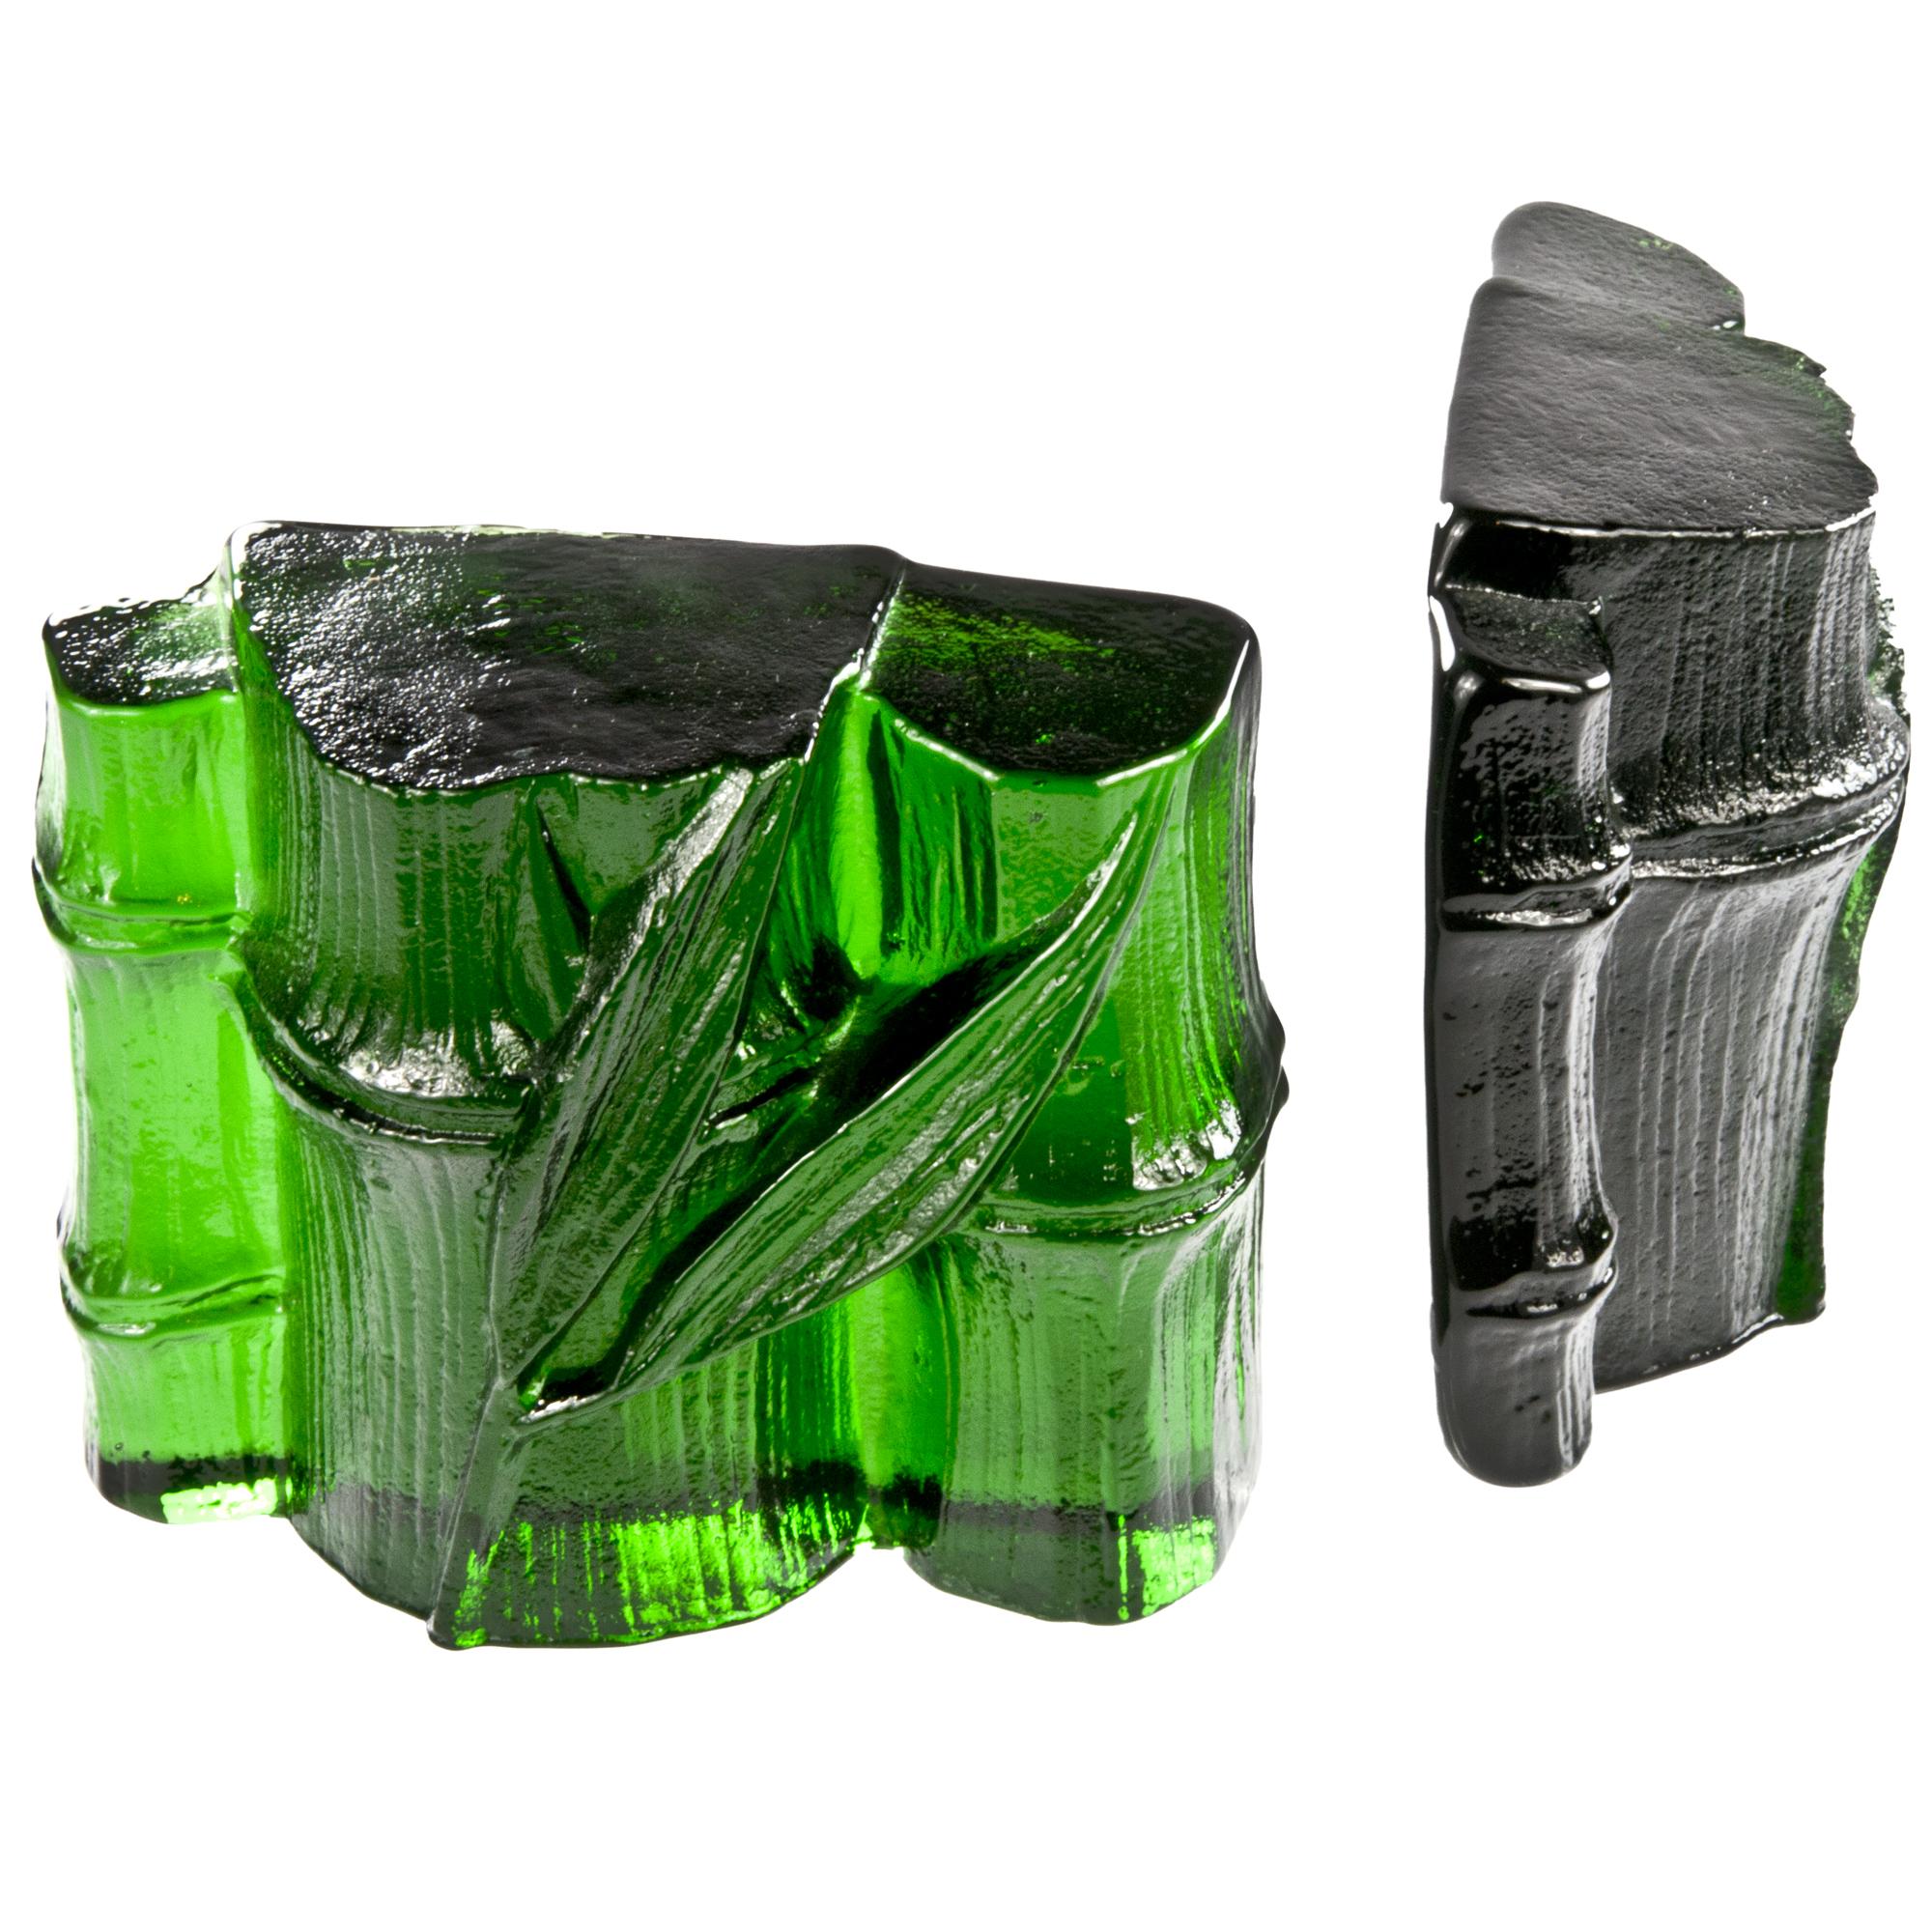 Blenko Green Glass Bamboo Bookends | Chairish